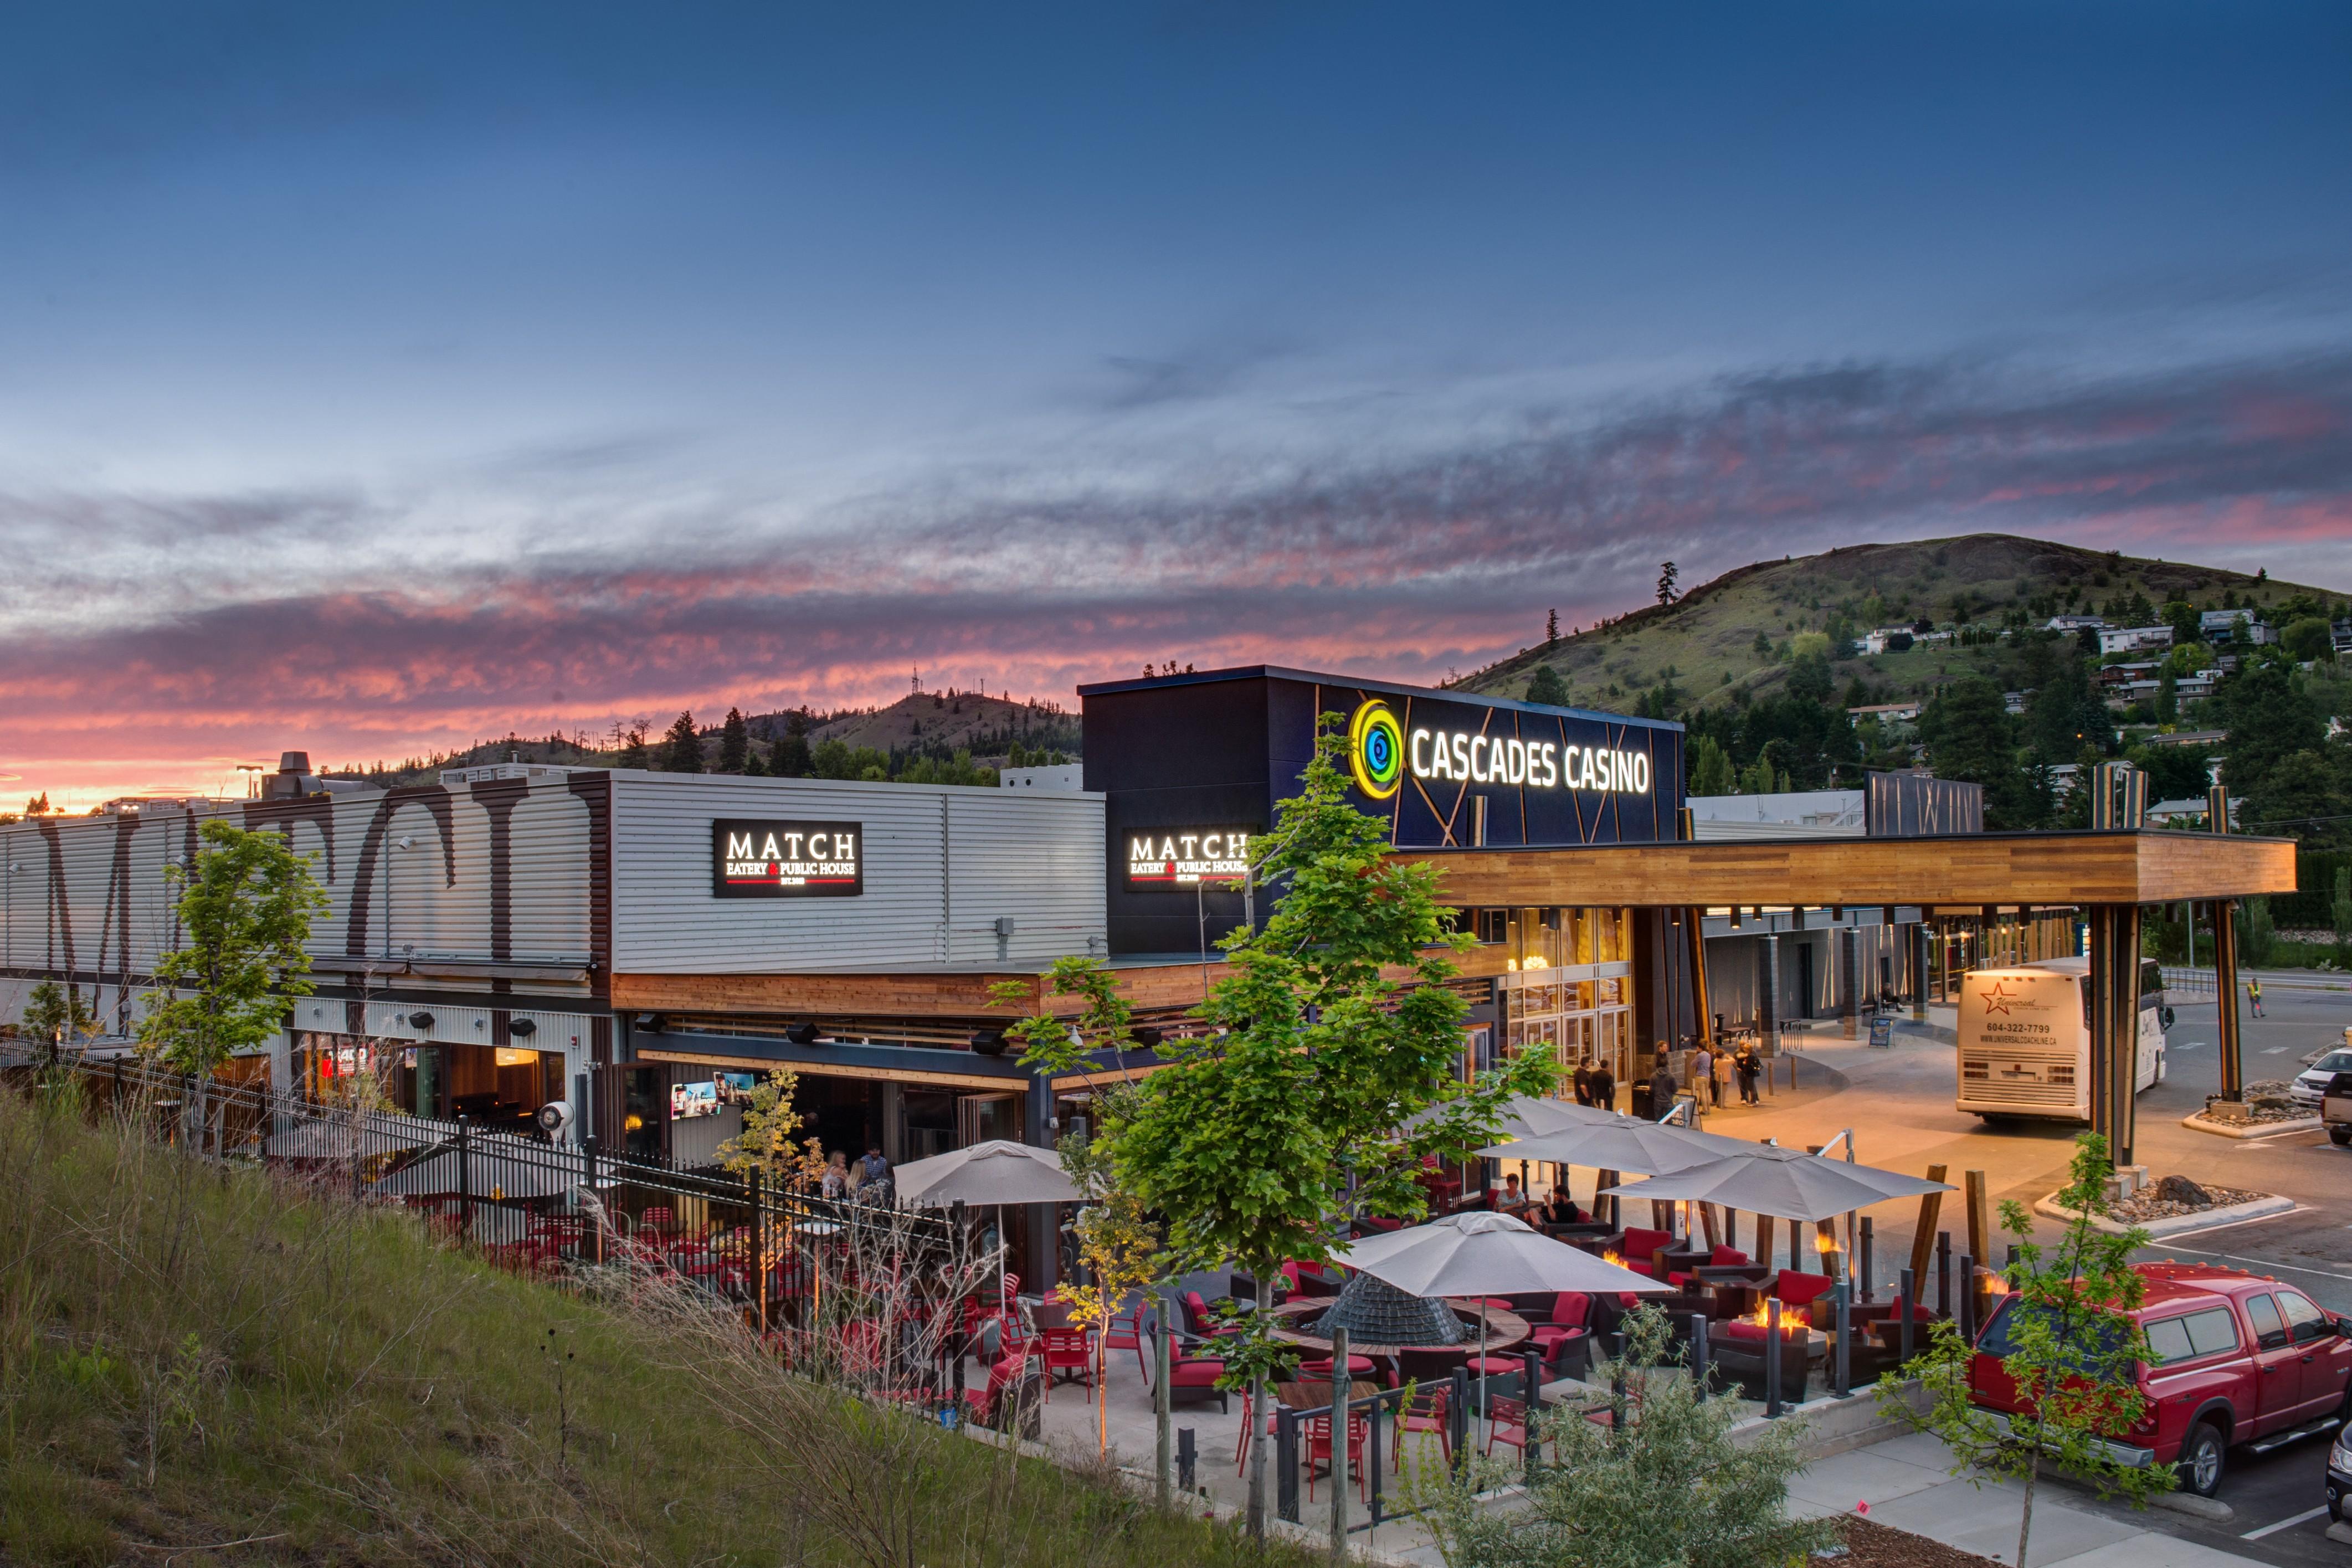 Gateway casino employment james bond casino night